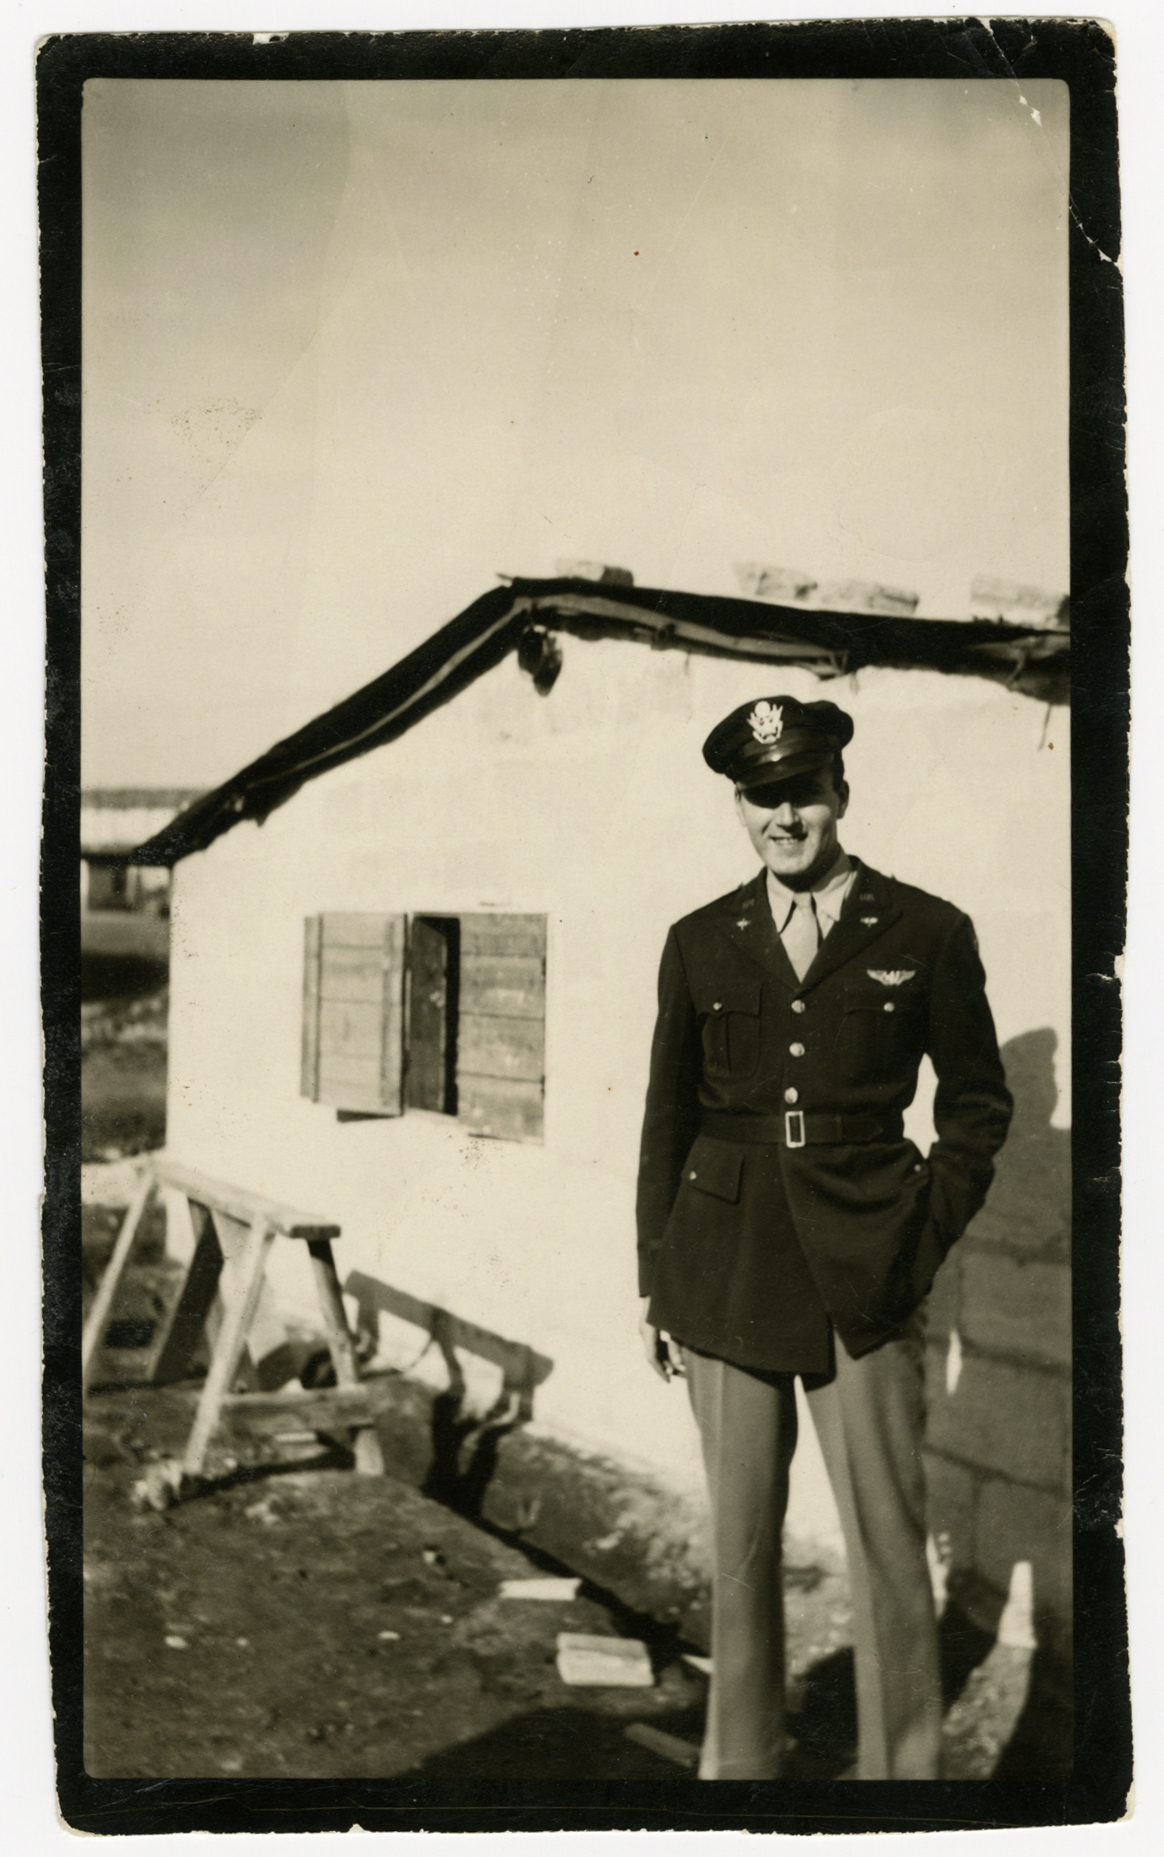 1st Lieutenant Harold L. Glasser